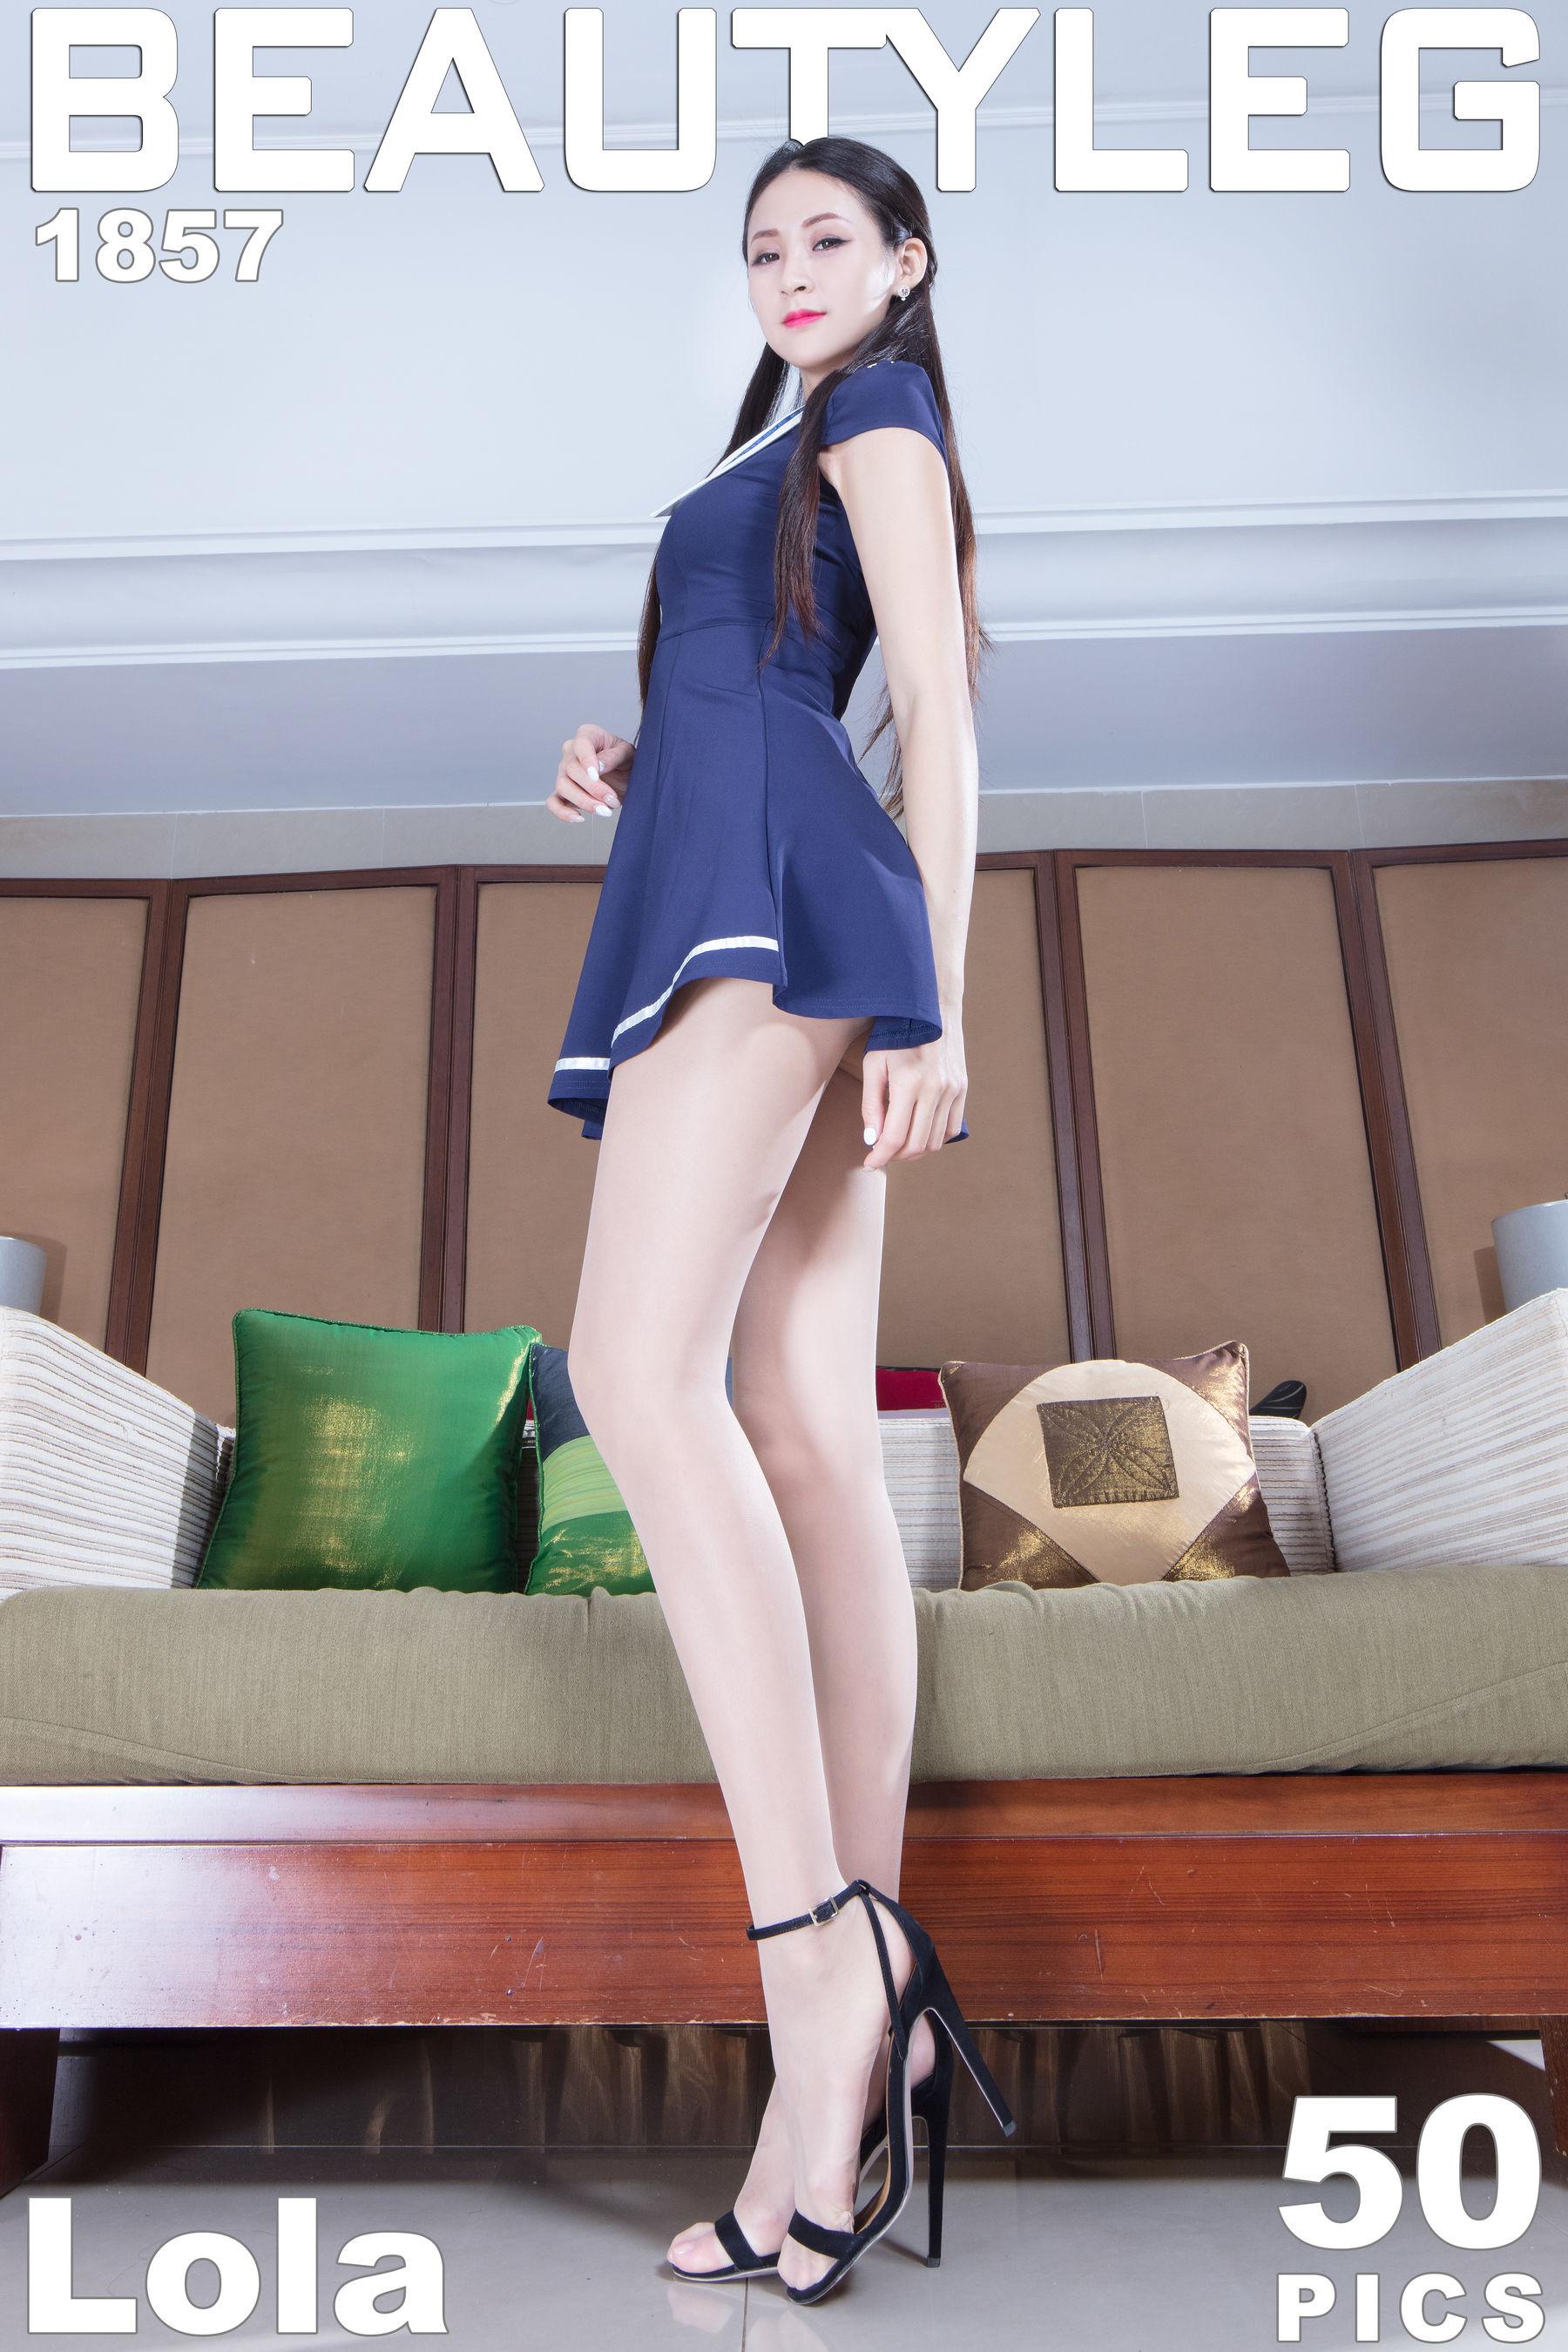 VOL.765 [Beautyleg]超短裙美腿高跟:Lola雪岑(腿模Lola)超高清个人性感漂亮大图(44P)